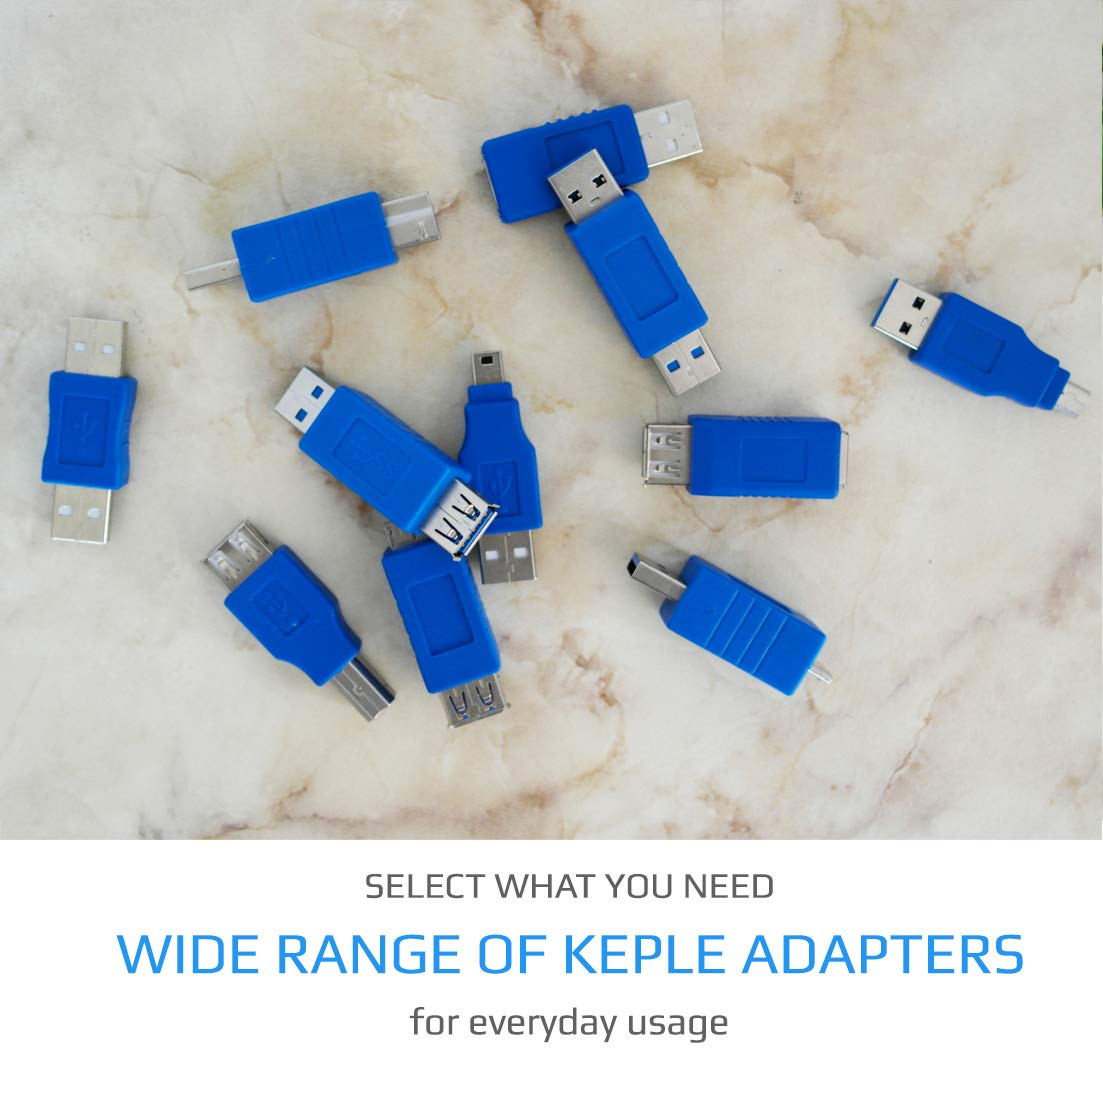 Paquete De 2 Keple 2 Peaces Quick Speed USB 3.0 Adaptador Macho A Hembra Fast 3.0 USB A Macho A Hembra Conector Acoplador Cambiador De G/énero Convertidor De Extensi/ón Corta para Computadoras